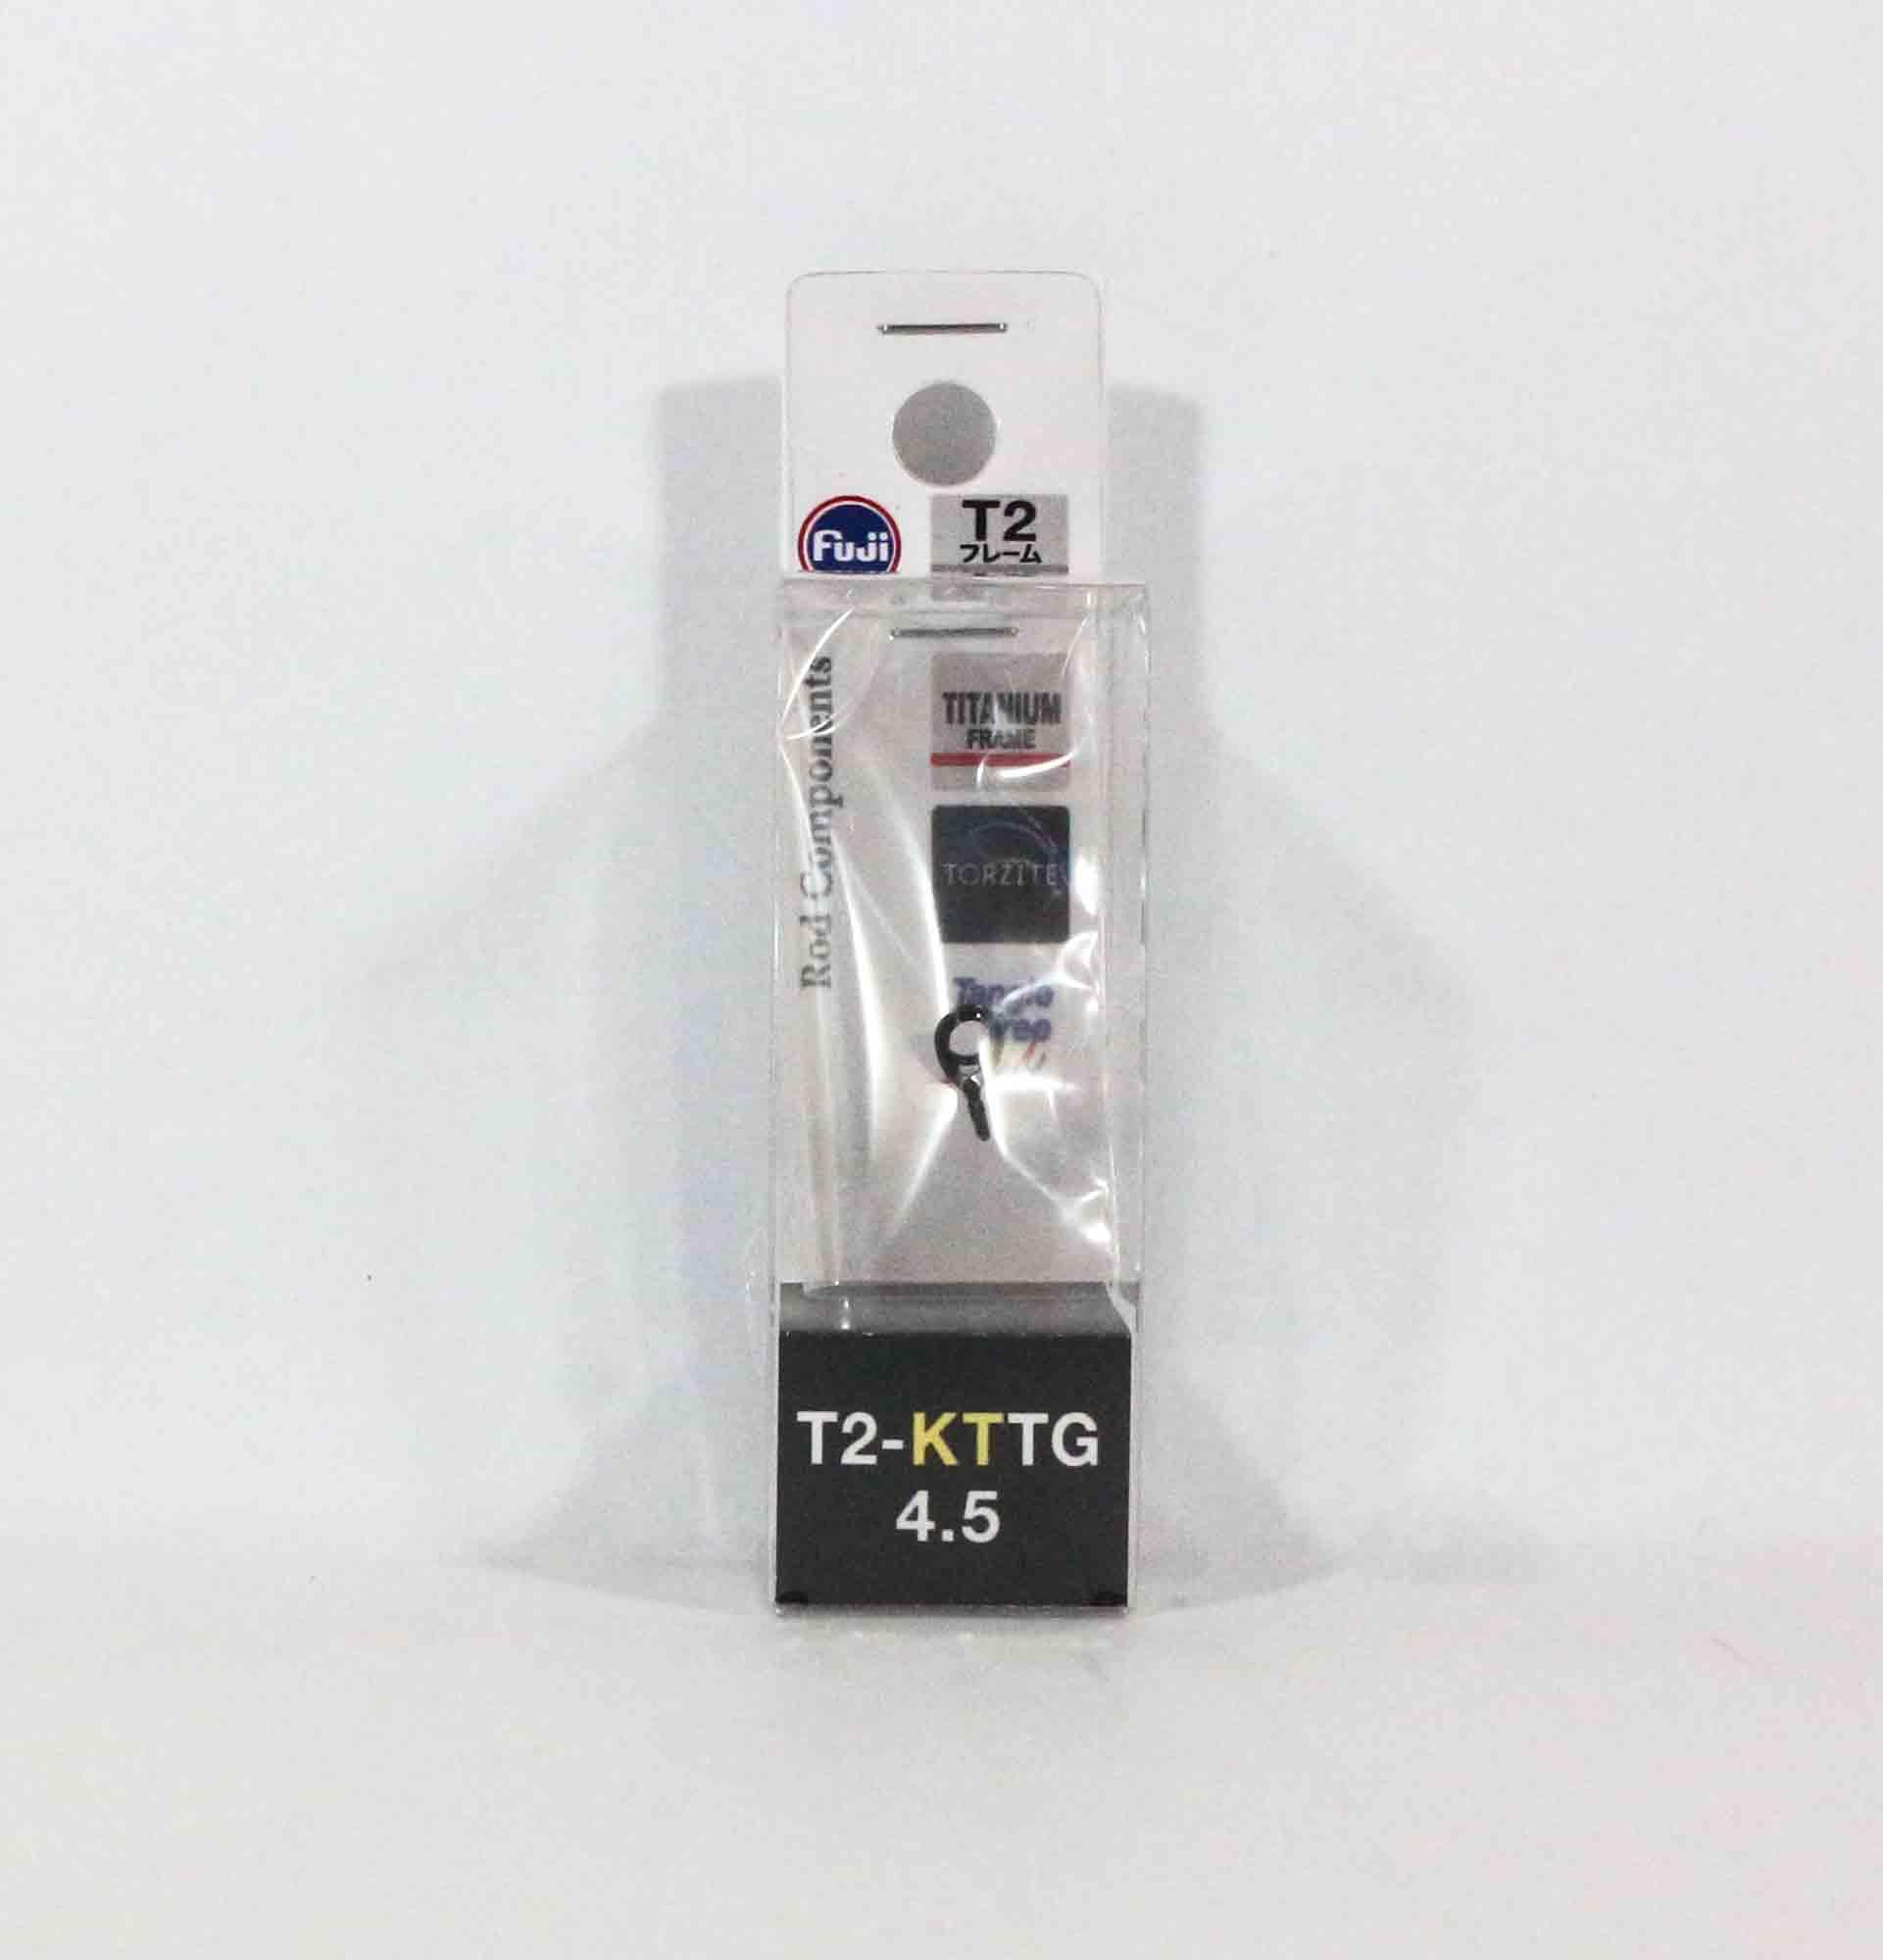 3978 Details about  /Fuji T-MNTT Size 5.5-1.4 Rod Top Guide Torzite Titanium Frame x 1 piece